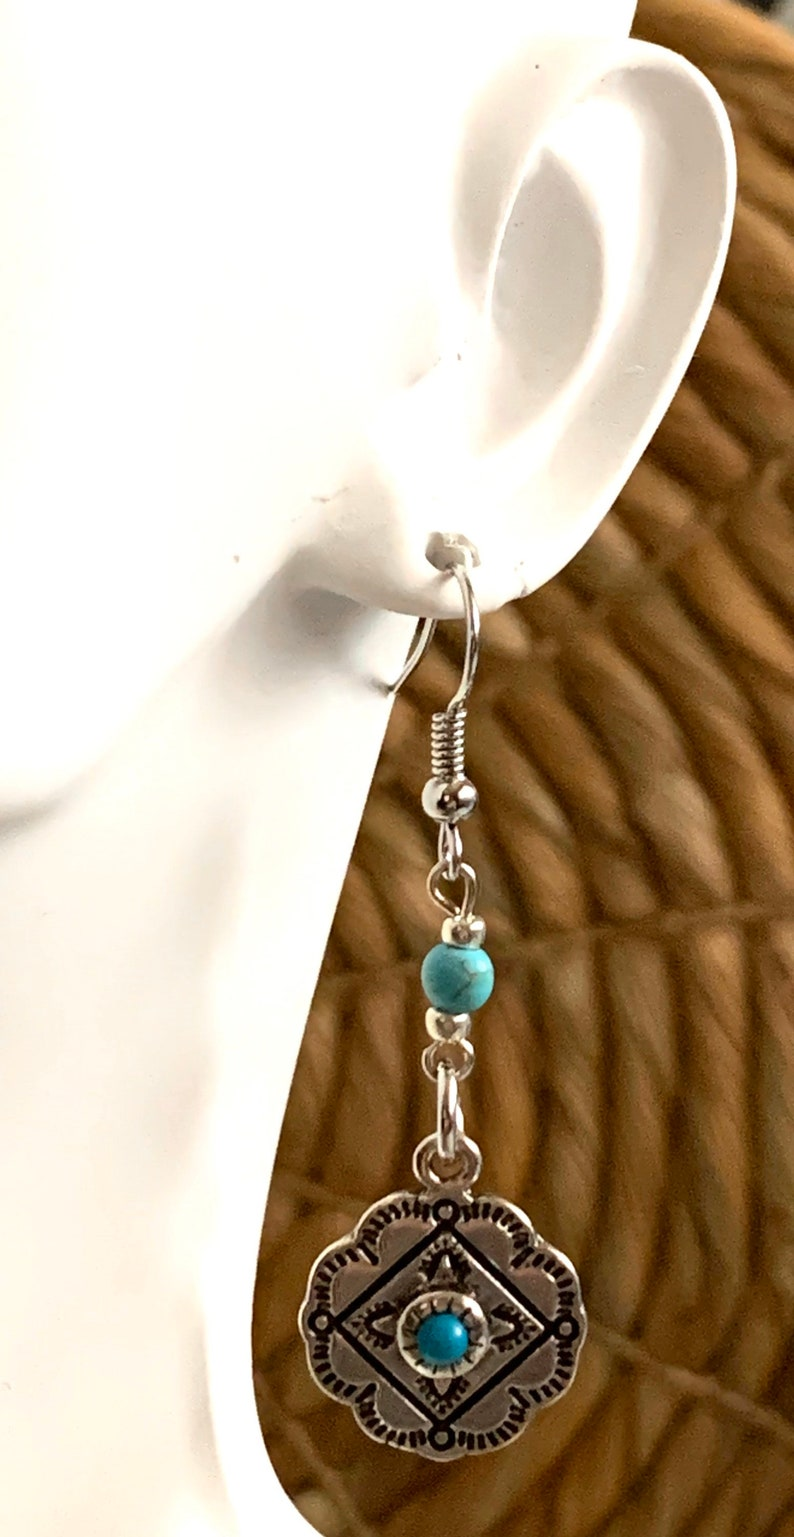 Western Jewelry Silver Concho Dangle Earrings Cowgirl Jewelry